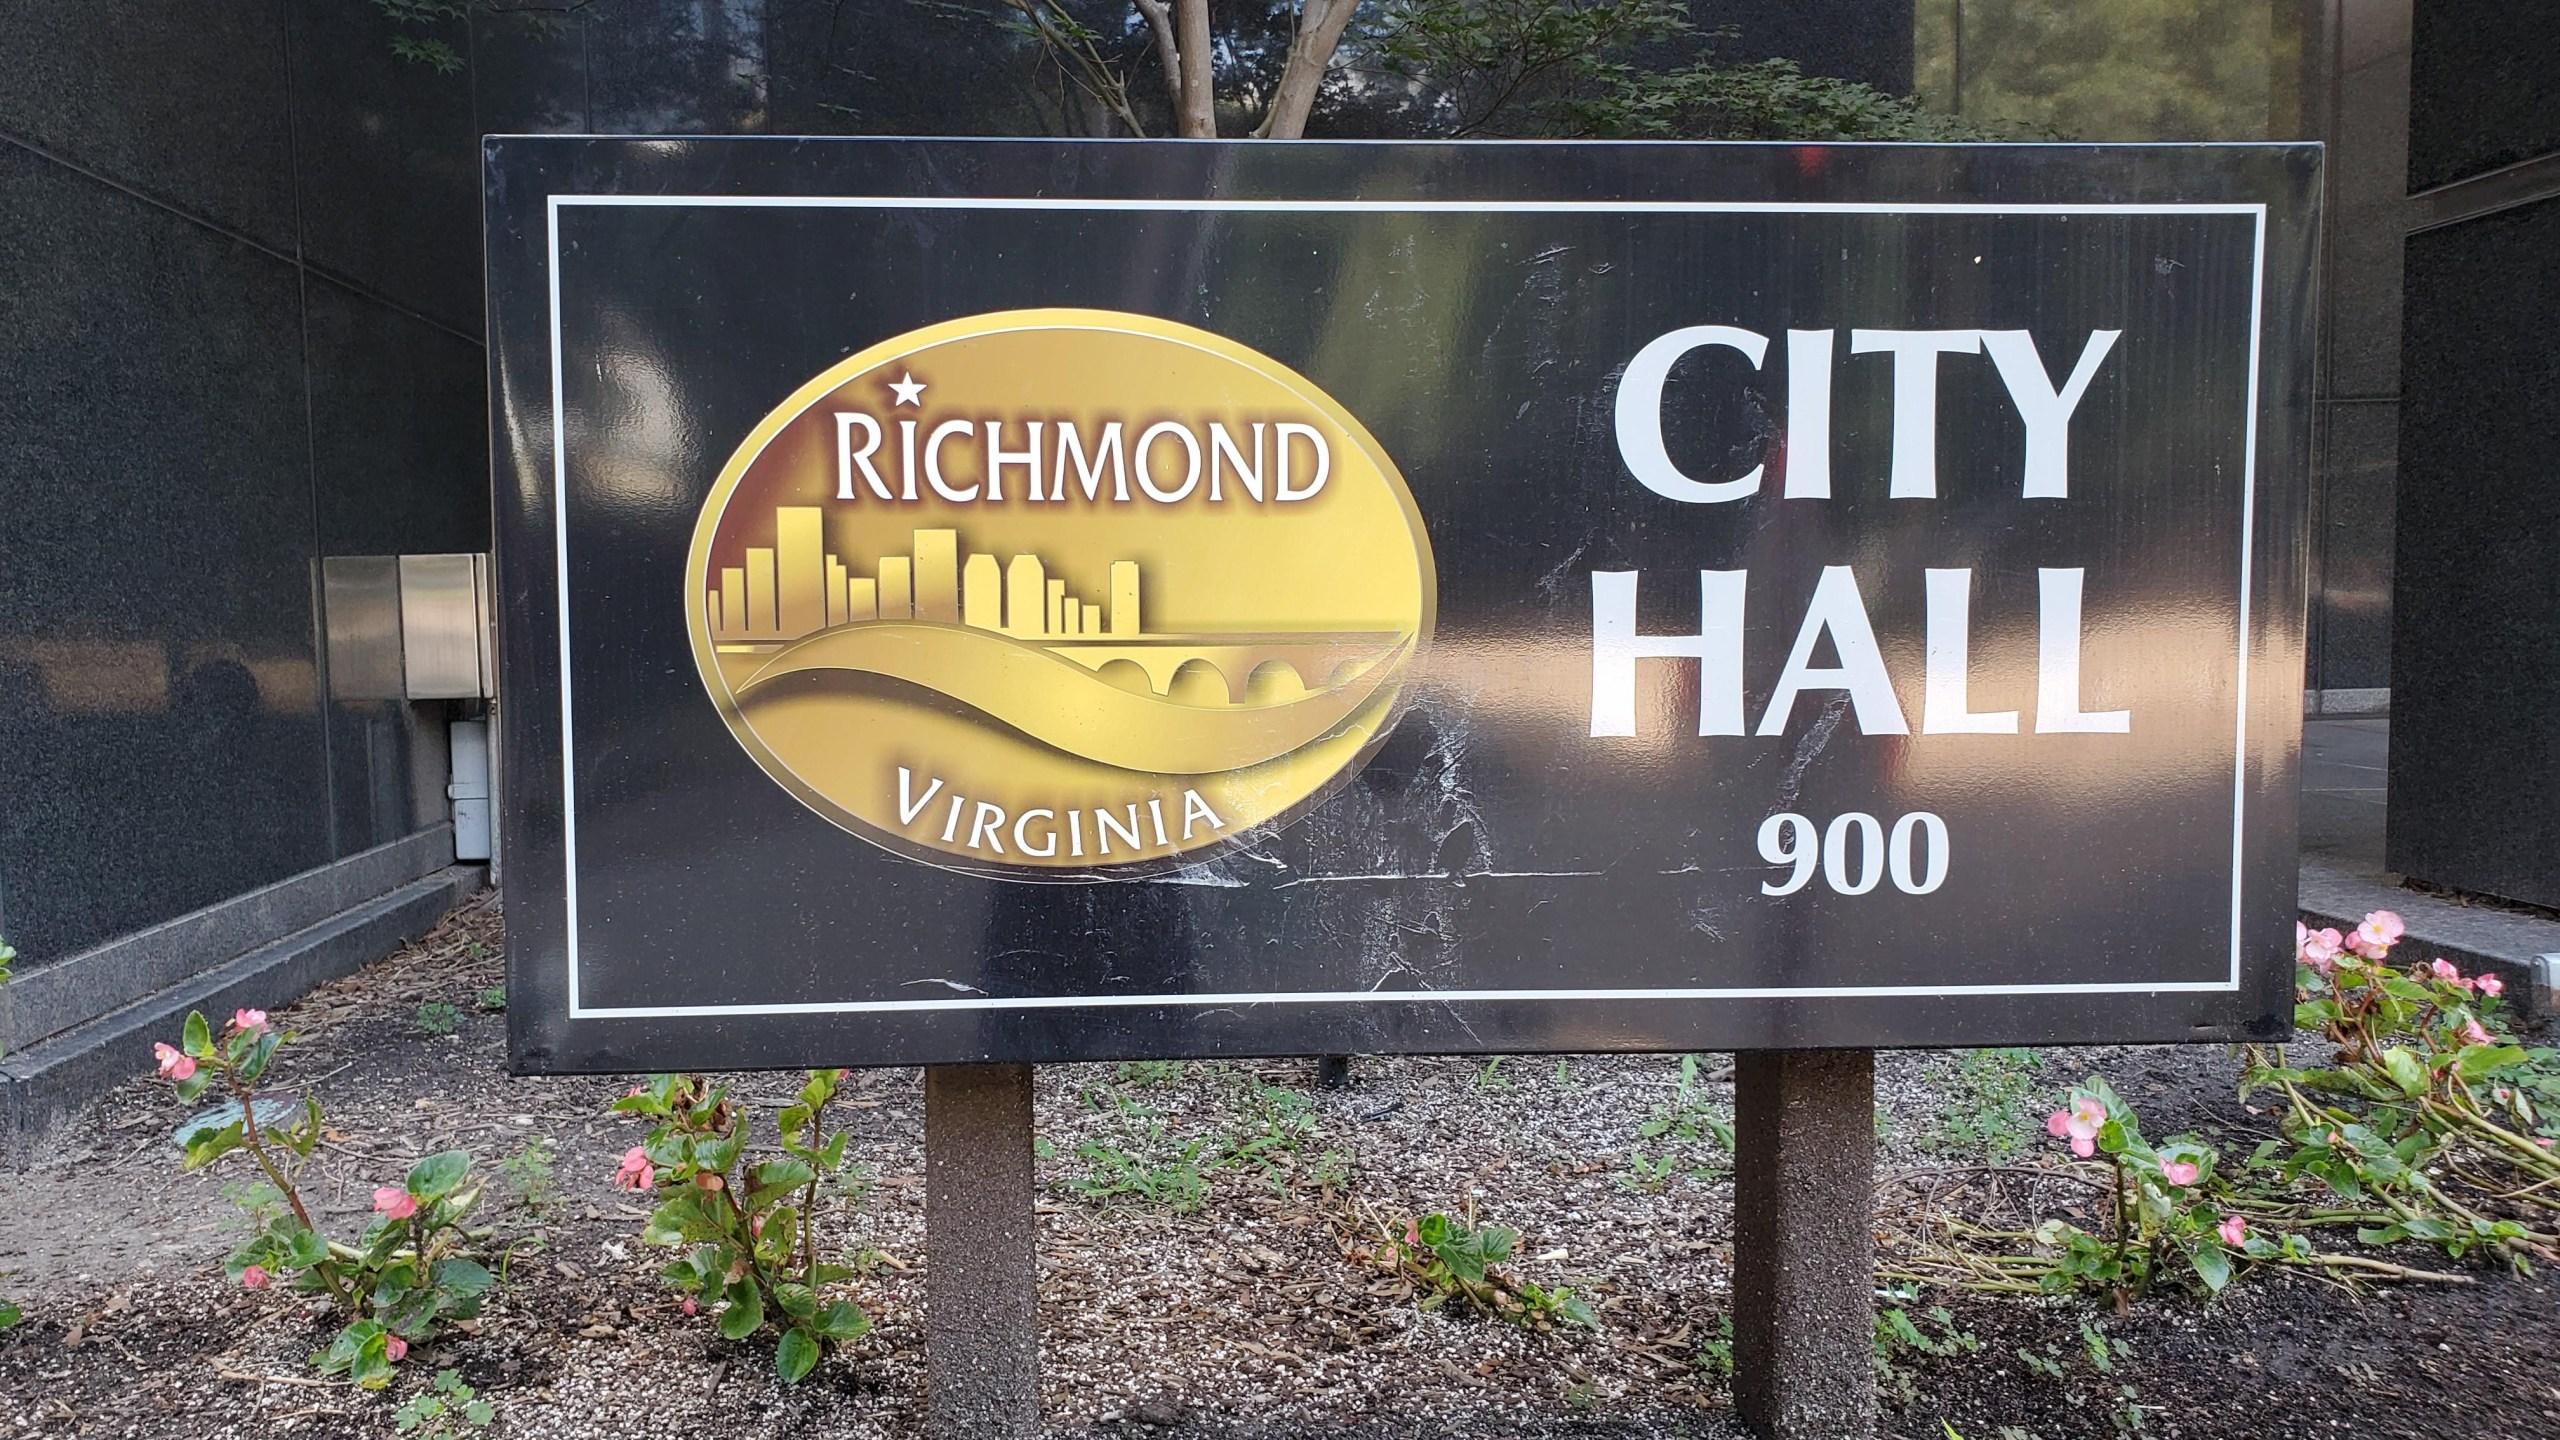 Richmond City Hall in Richmond, Virginia